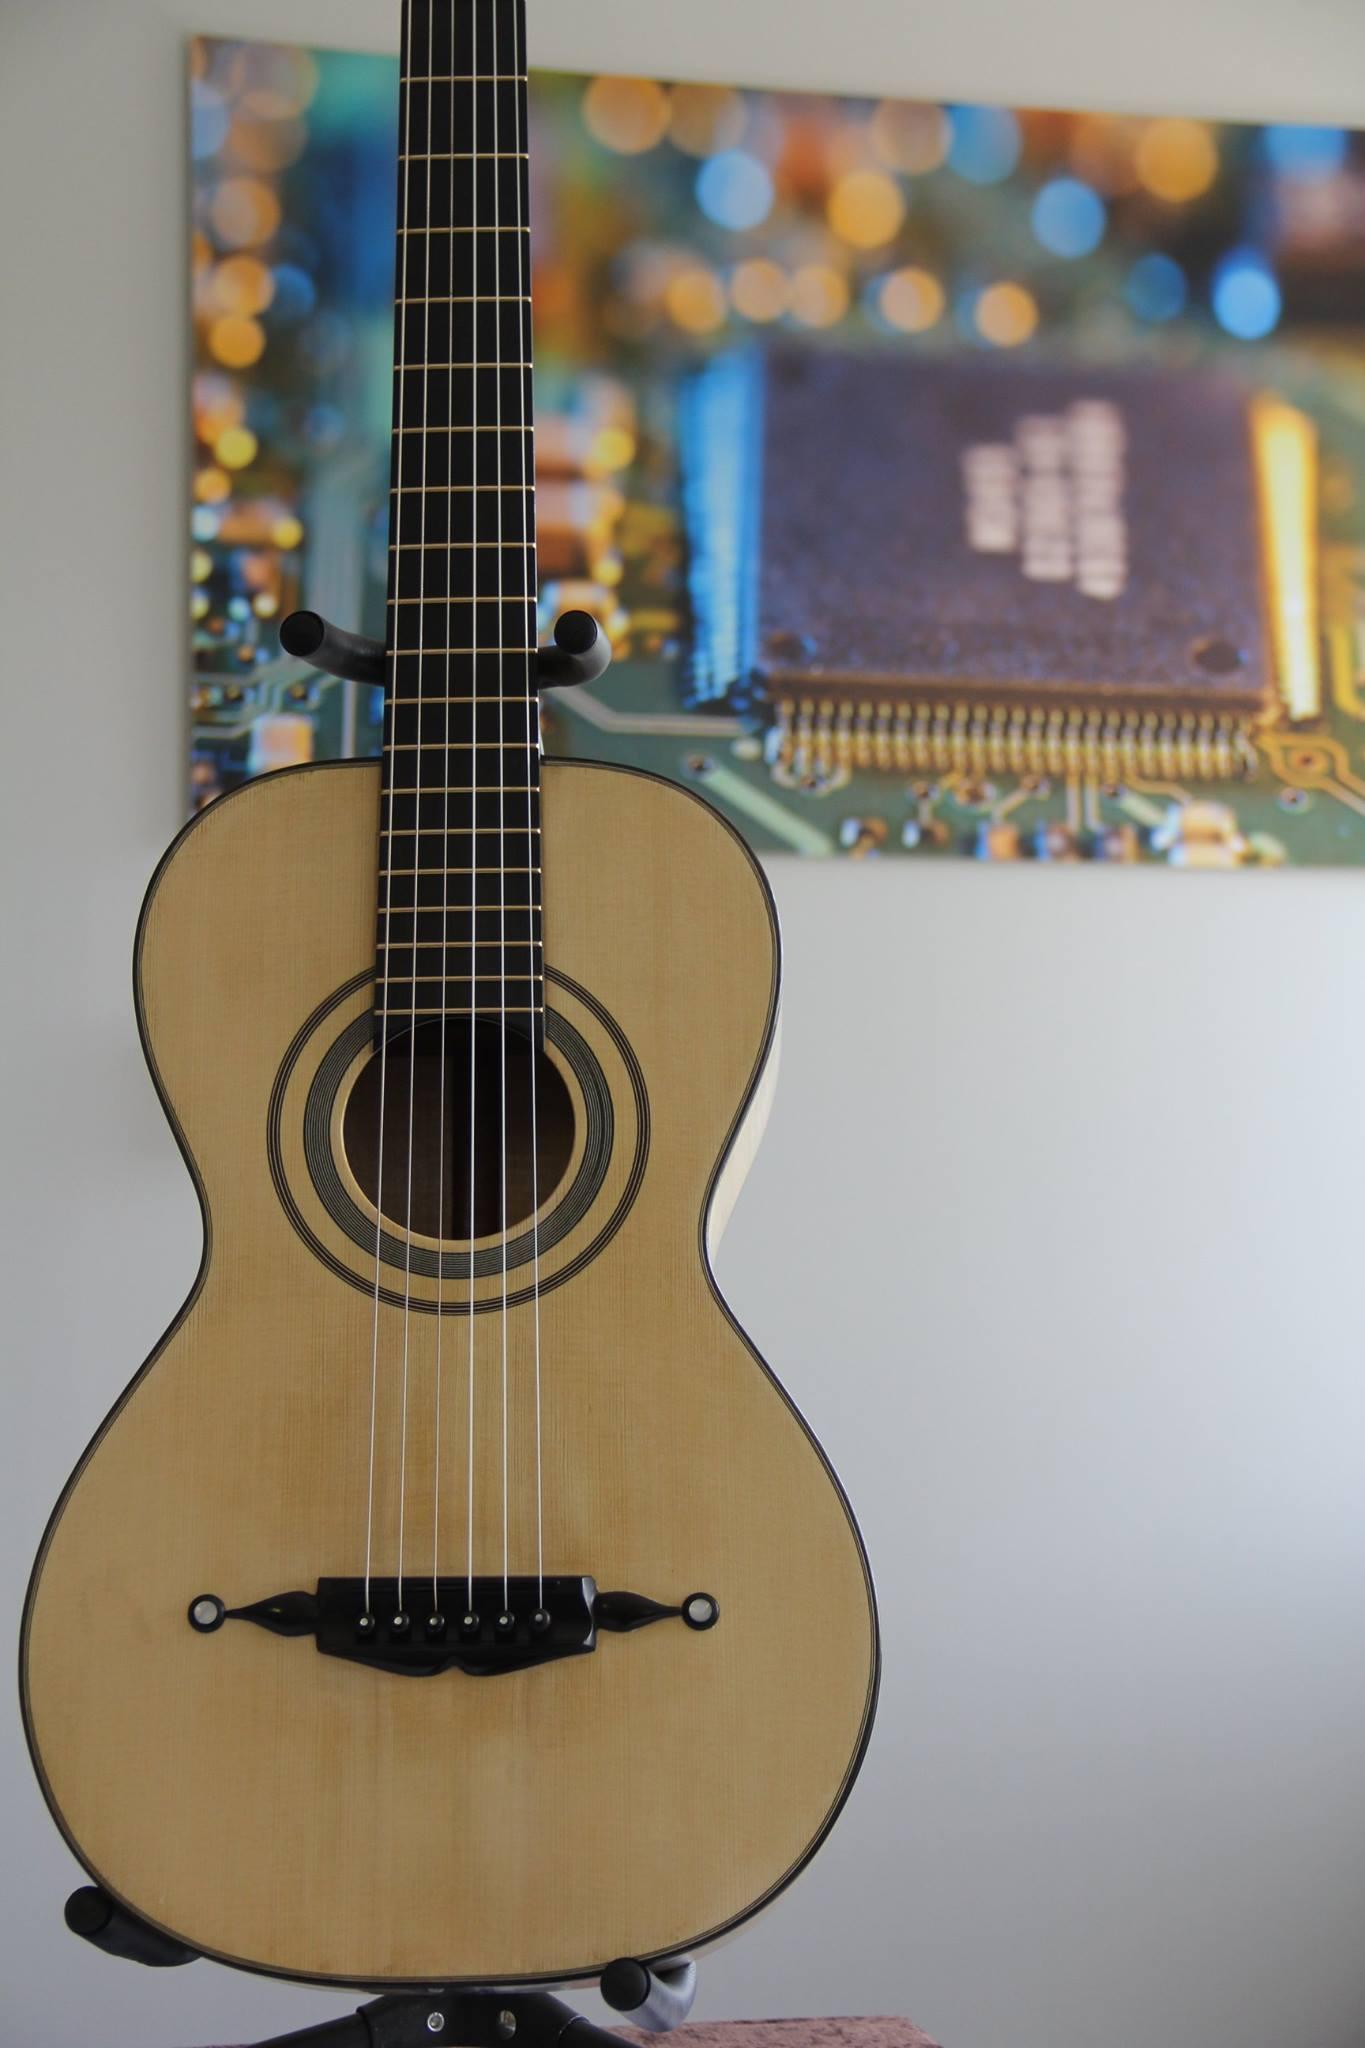 George Thomas Guitars